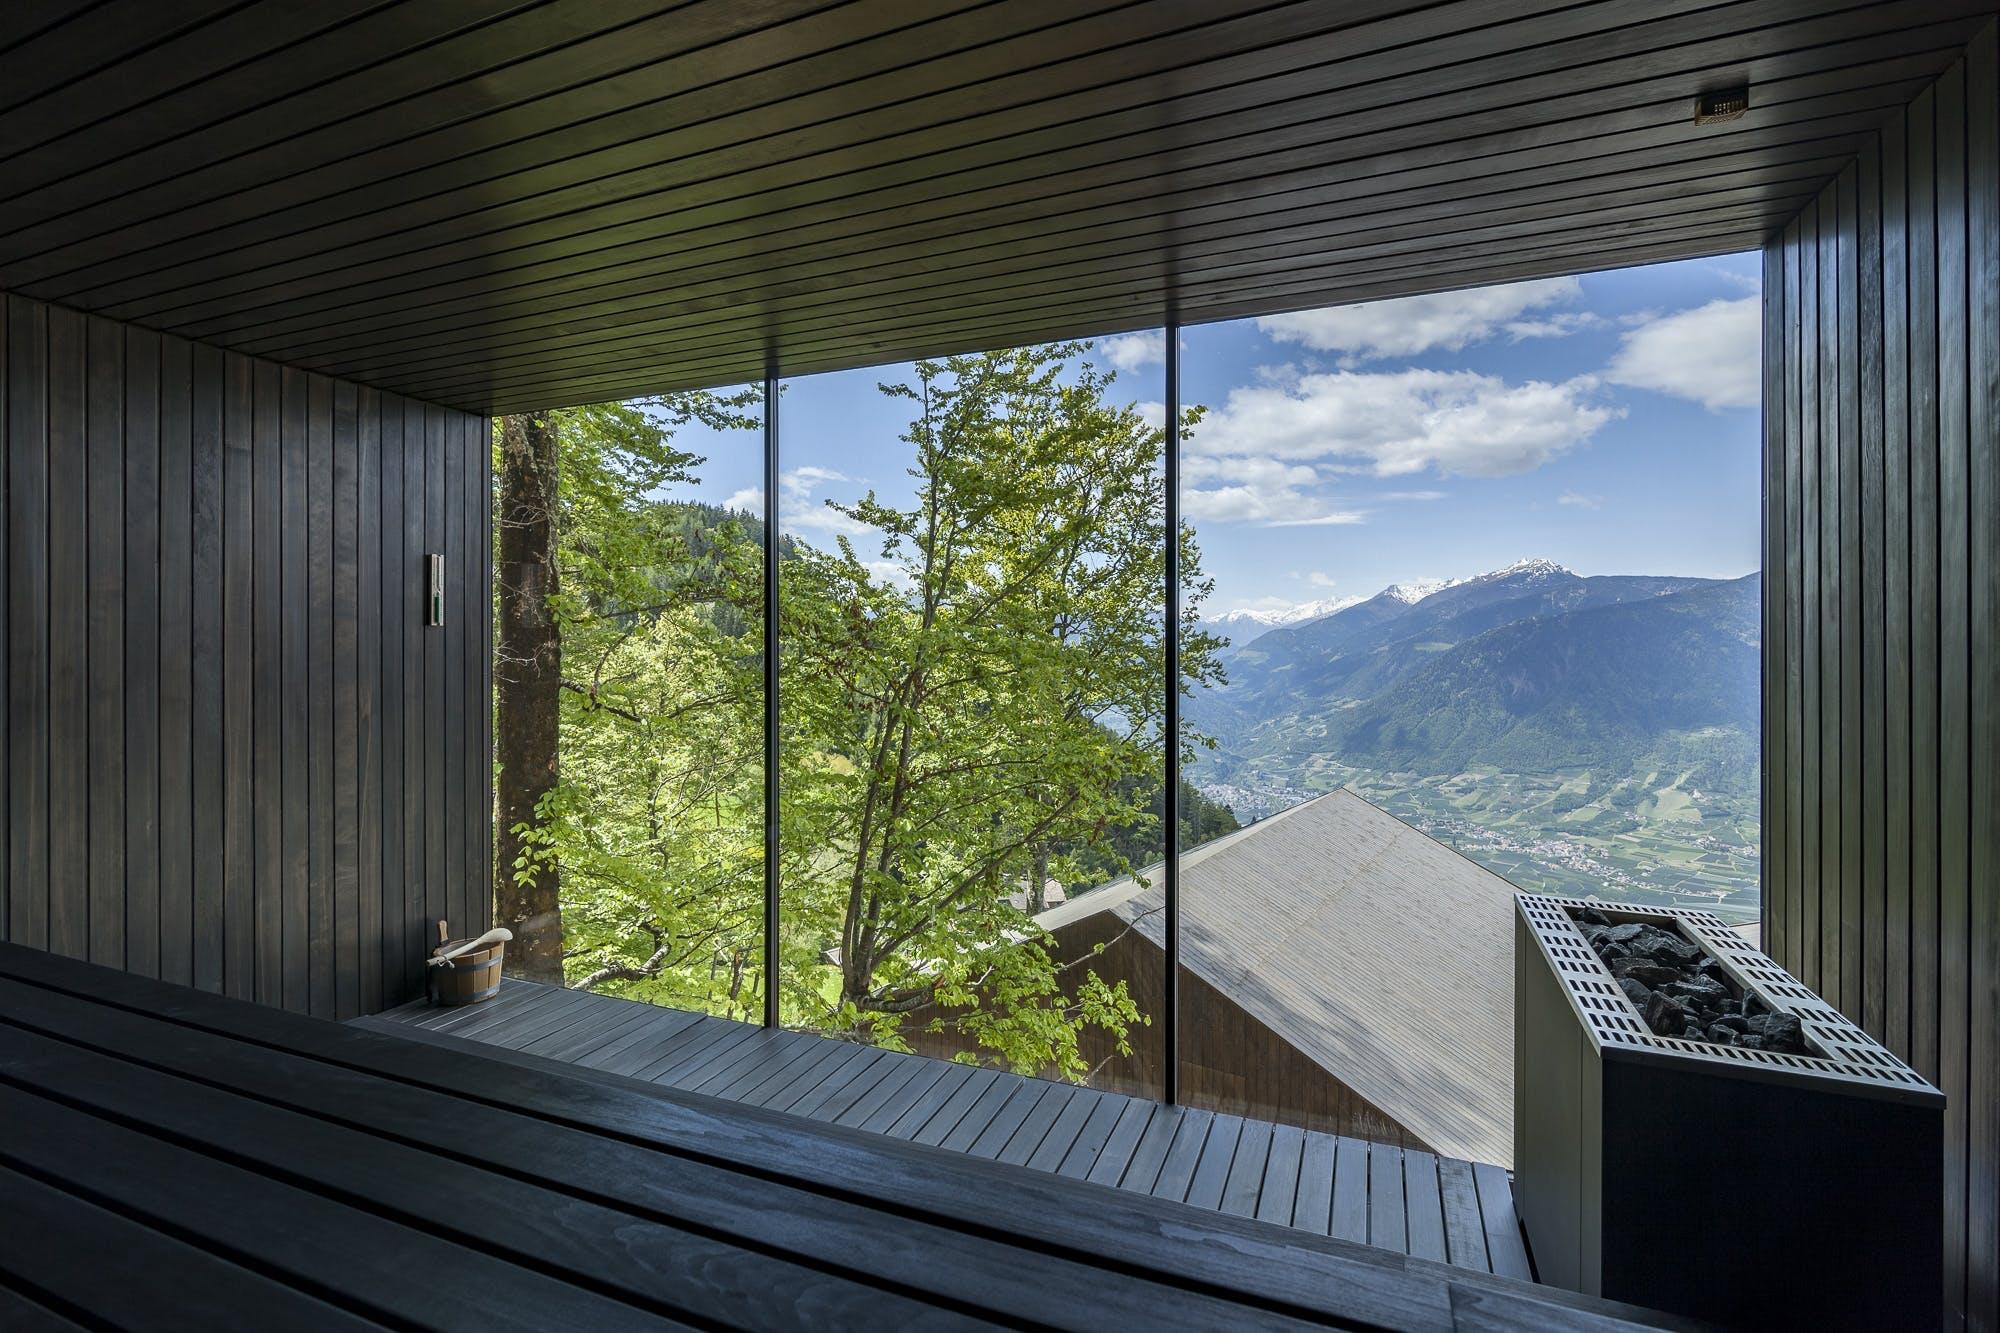 Sauna udsigt natur luksus